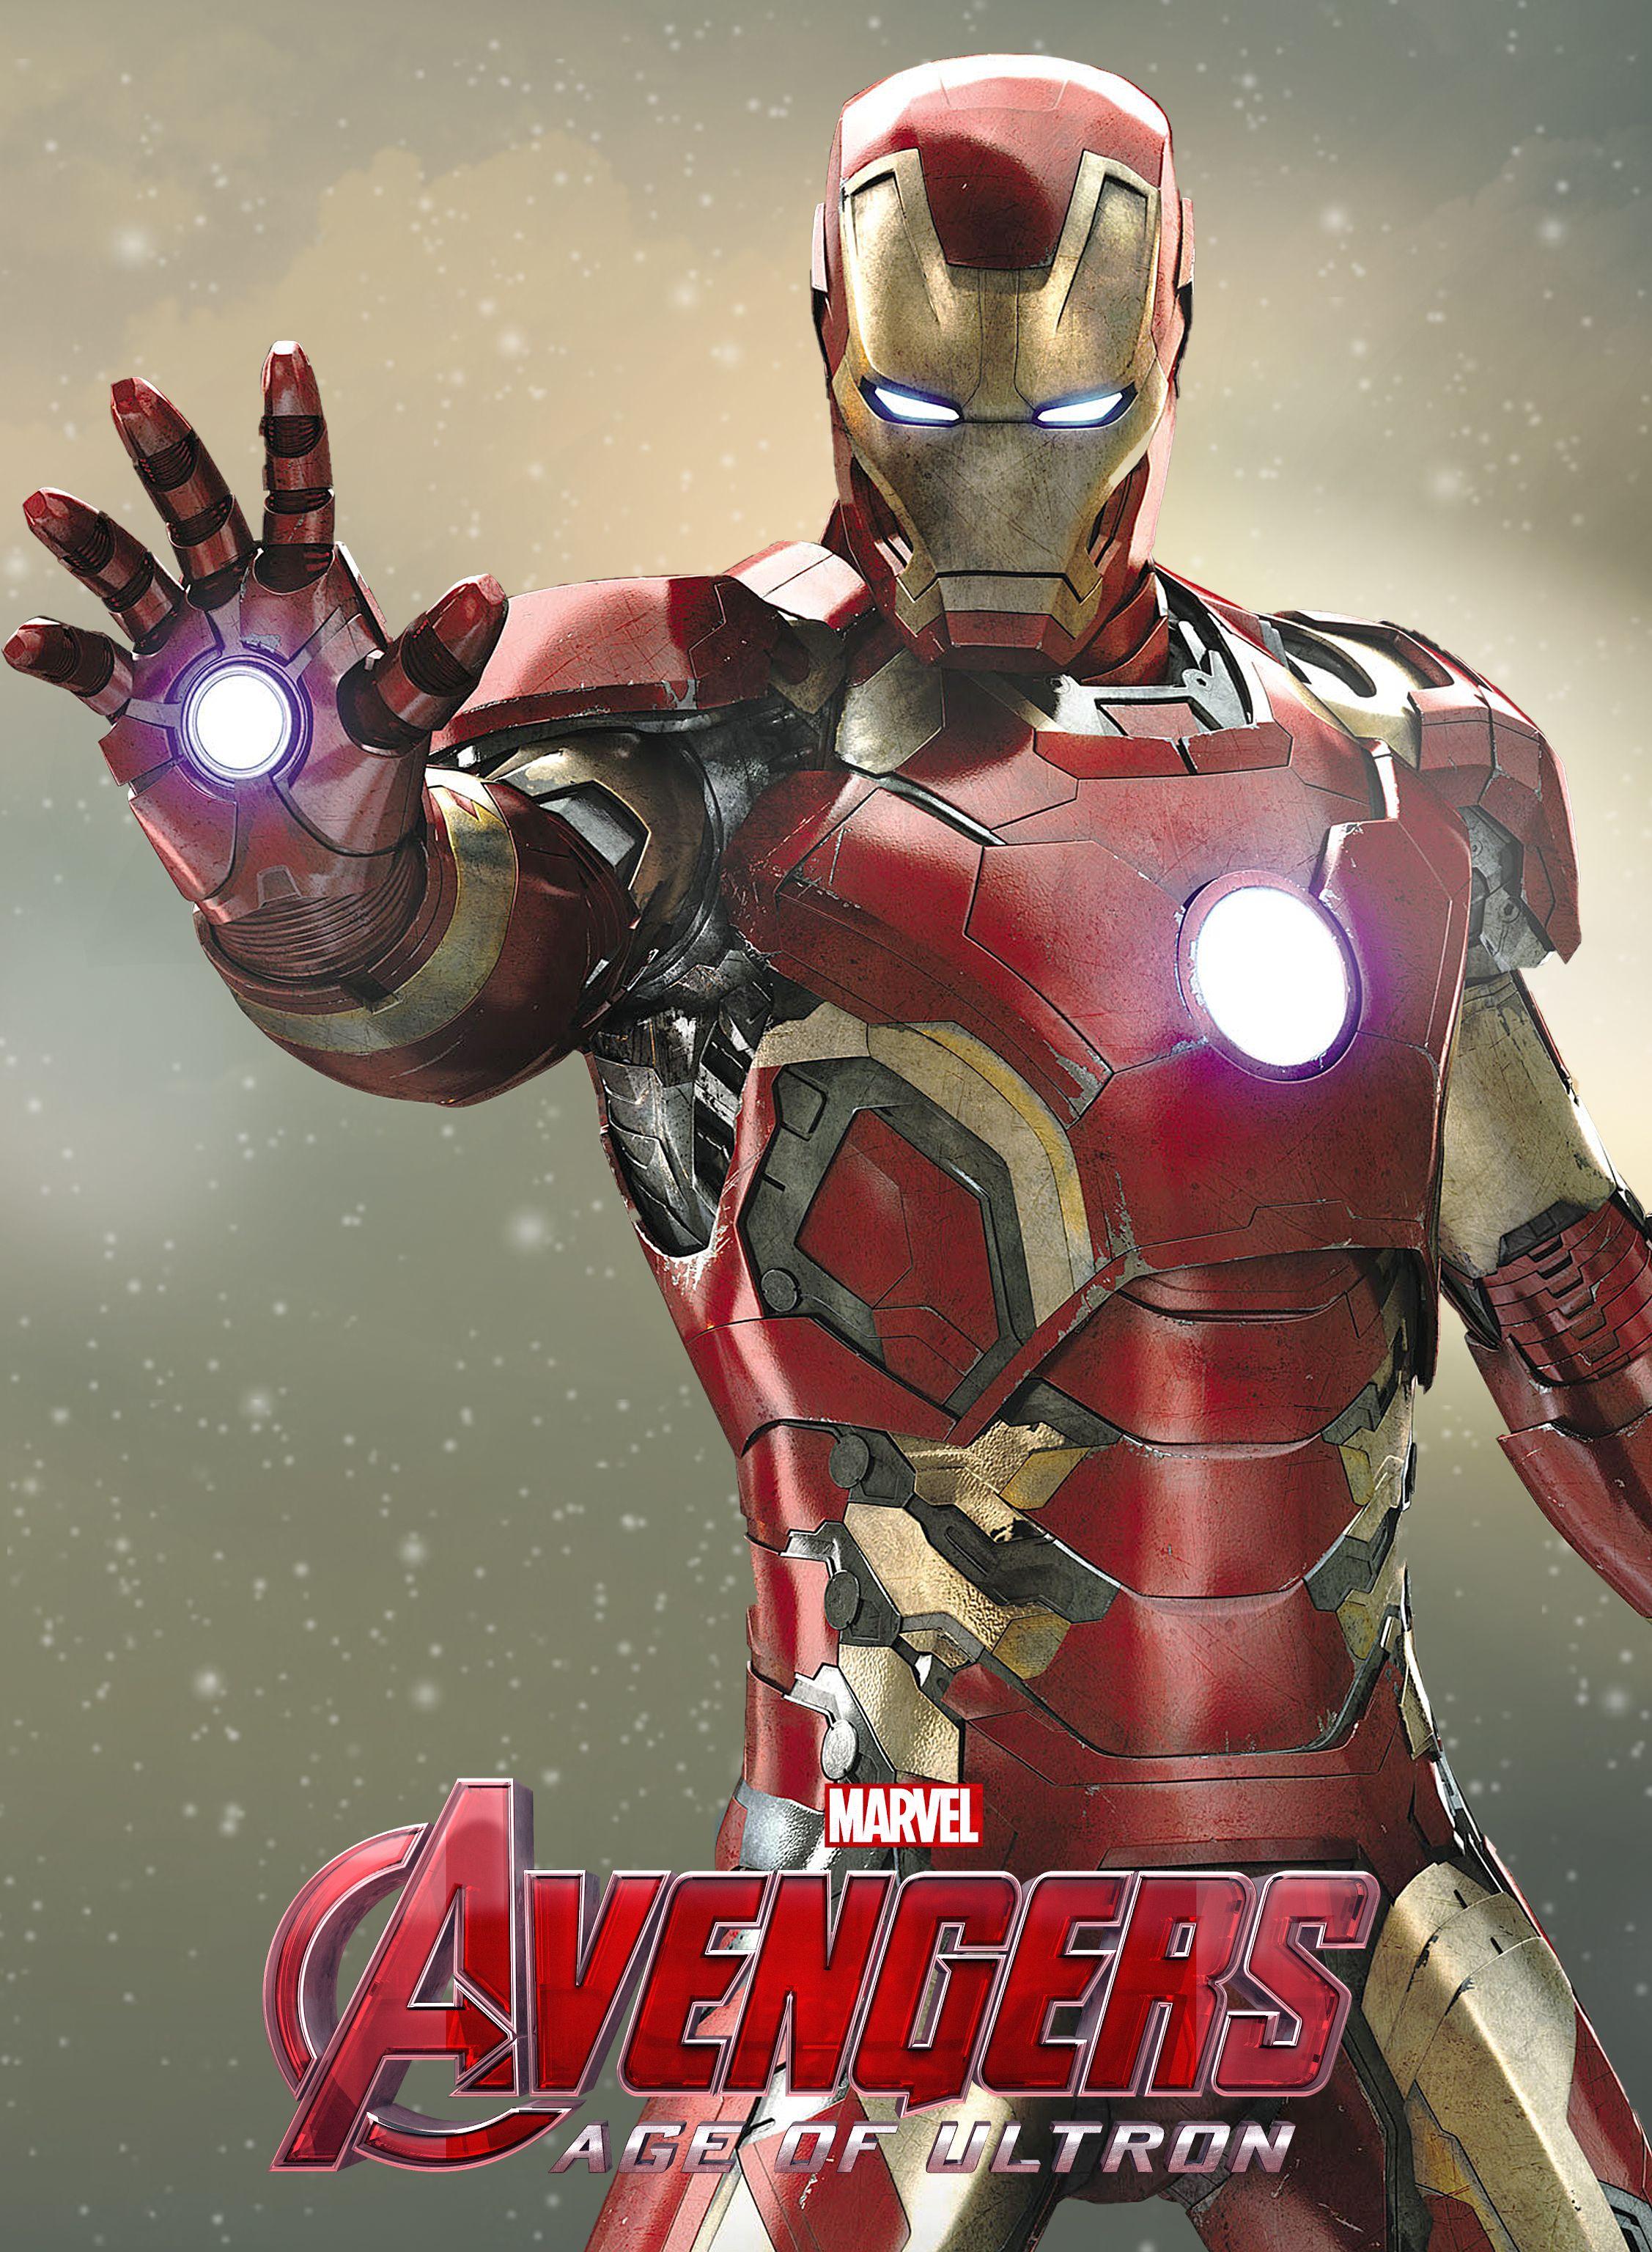 Avengers Age Of Ultron Iron Man Poster Iron Man Avengers Iron Man Wallpaper Avengers Poster Iron man age of ultron wallpaper